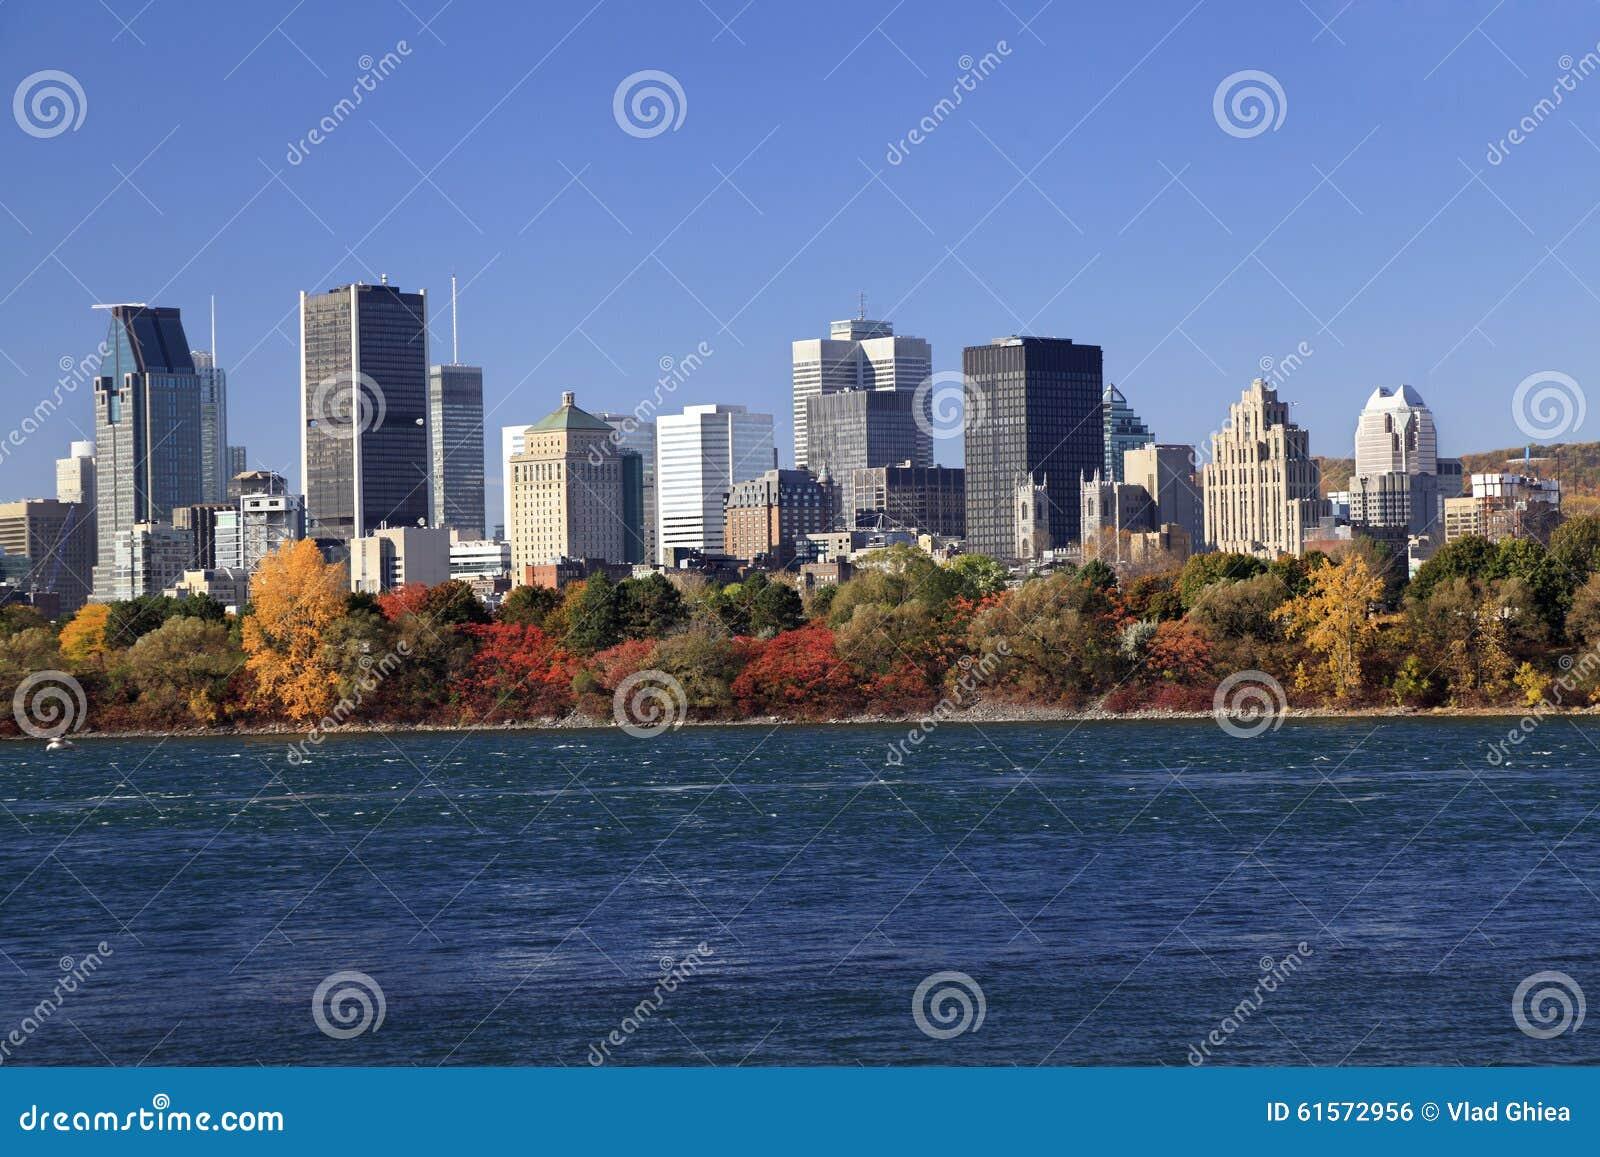 Montreal skyline in autumn, Canada